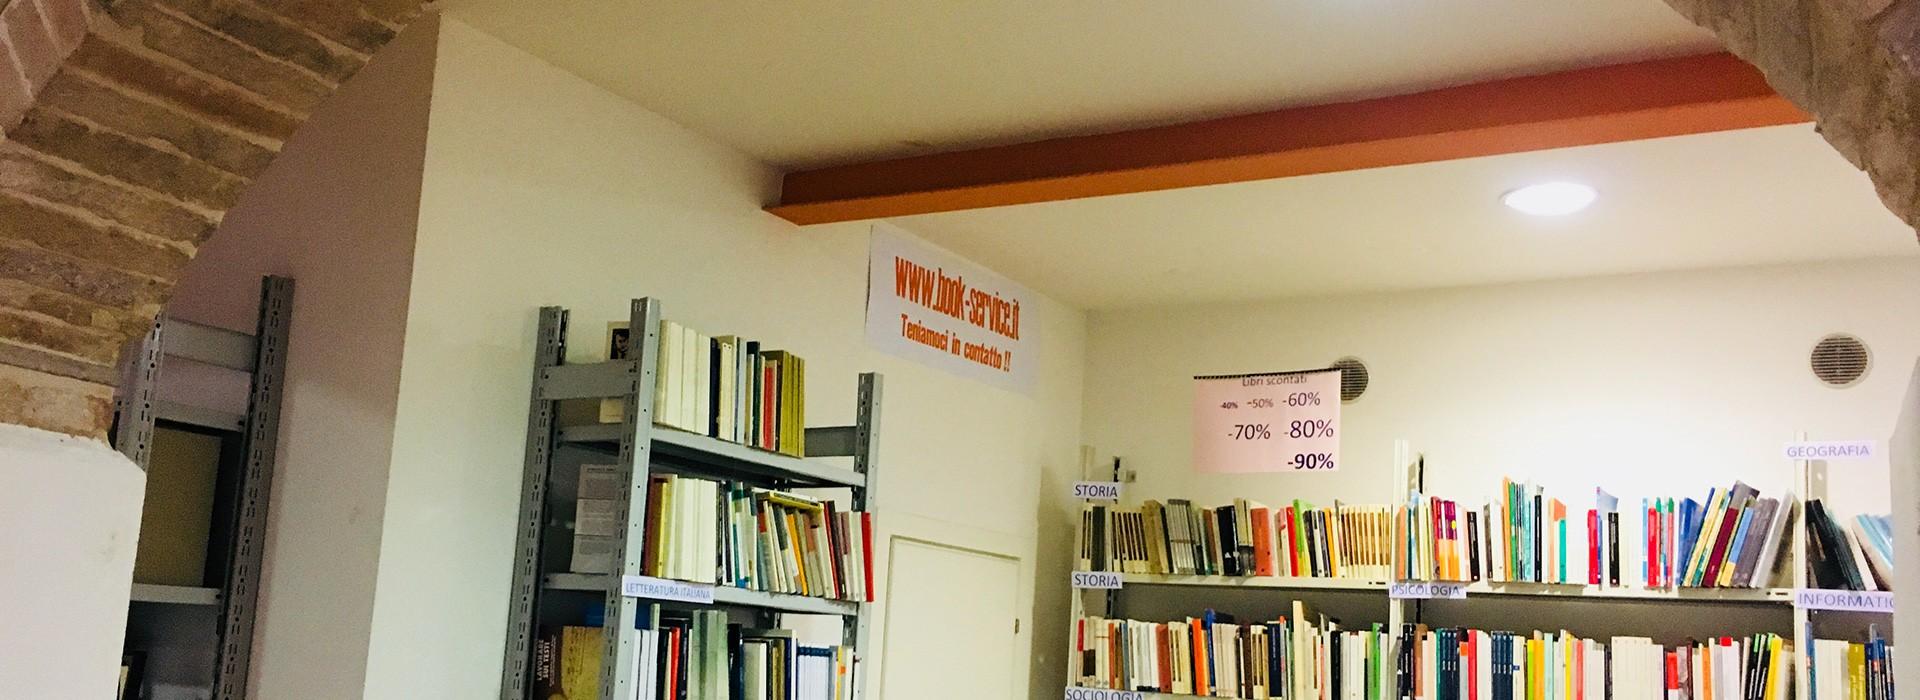 Libreria Moderna Urbino.Impaginazione E Stampa Tesi Di Laurea Urbino Book Service